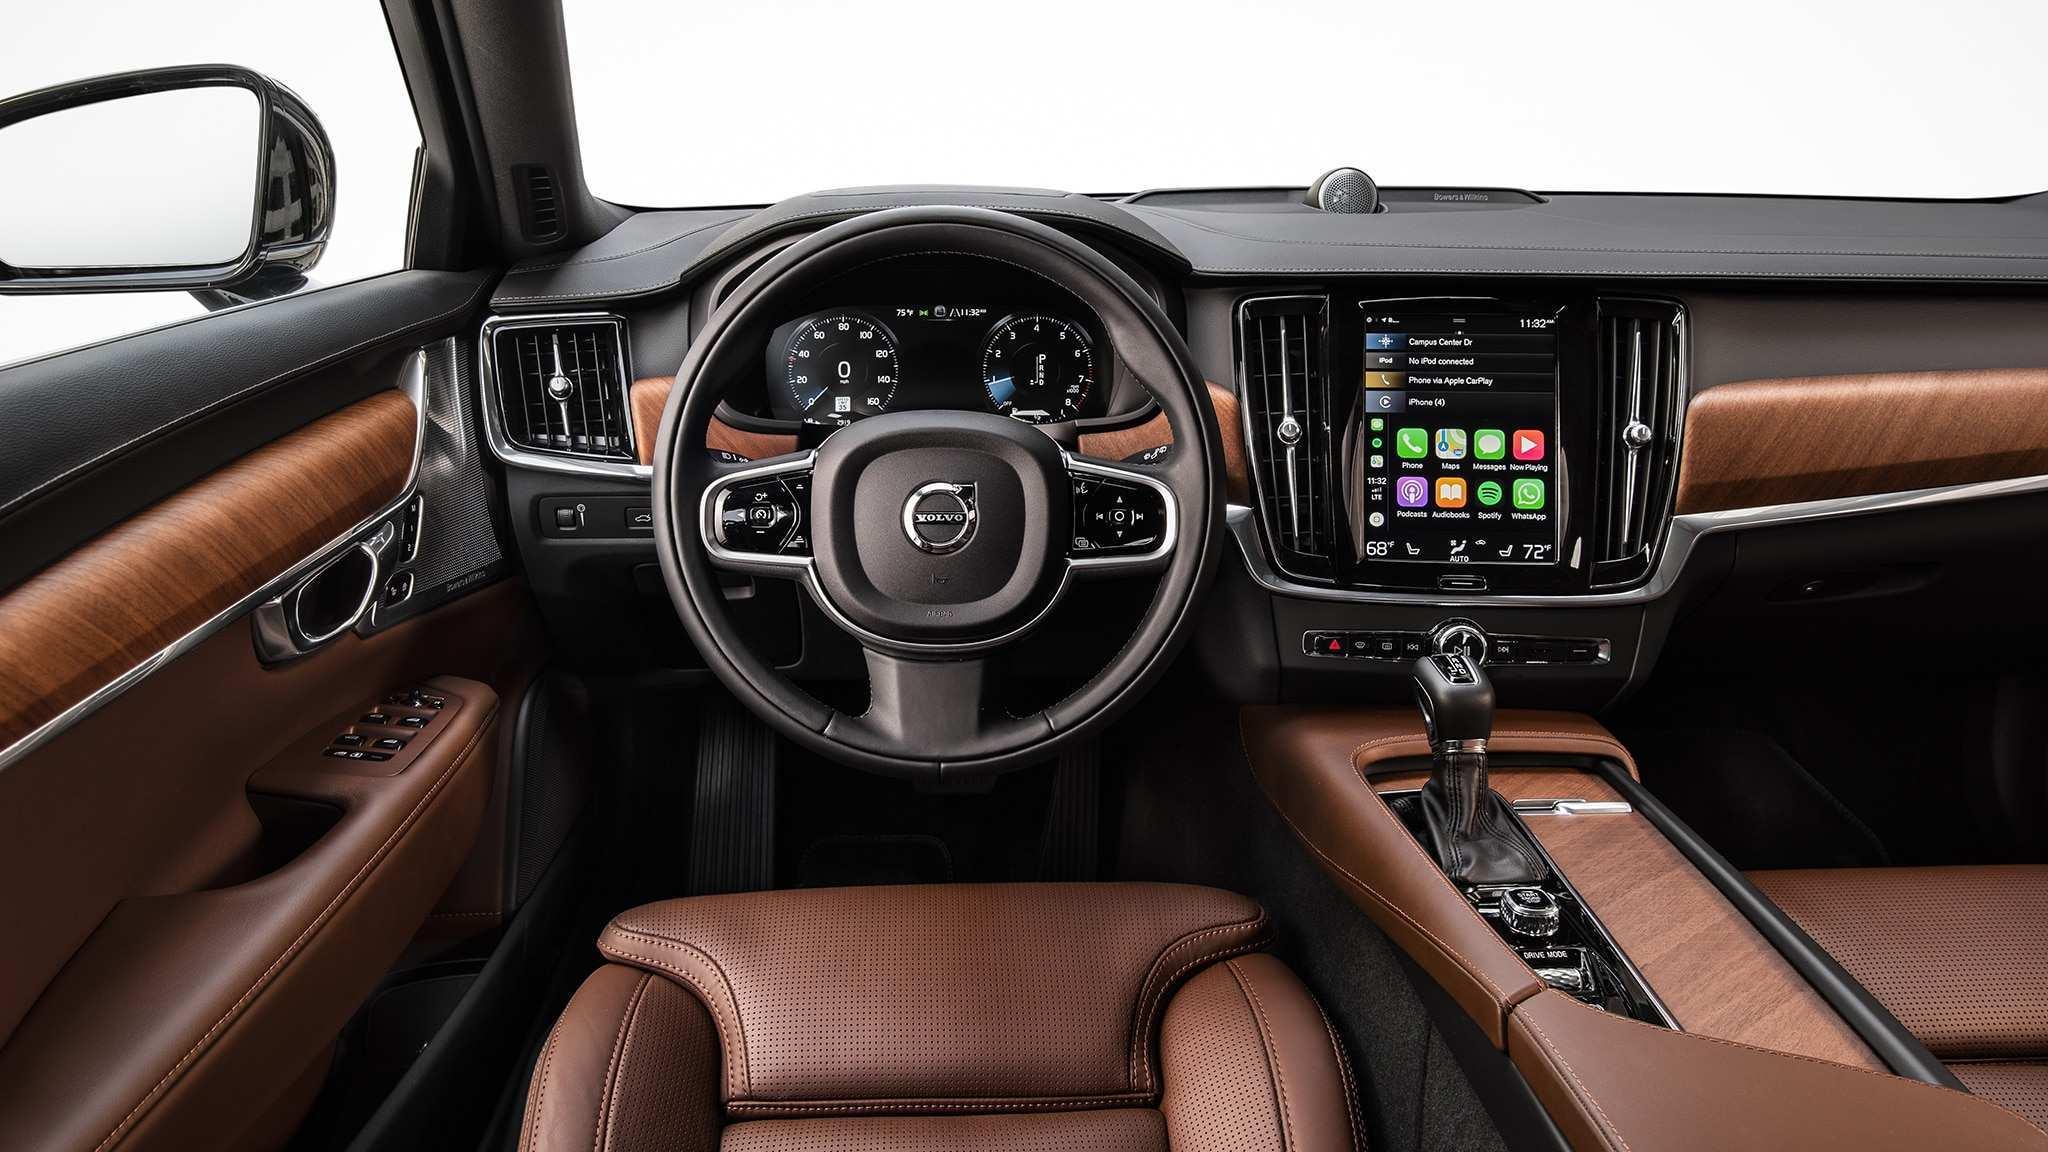 50 New V90 Volvo 2019 Images with V90 Volvo 2019